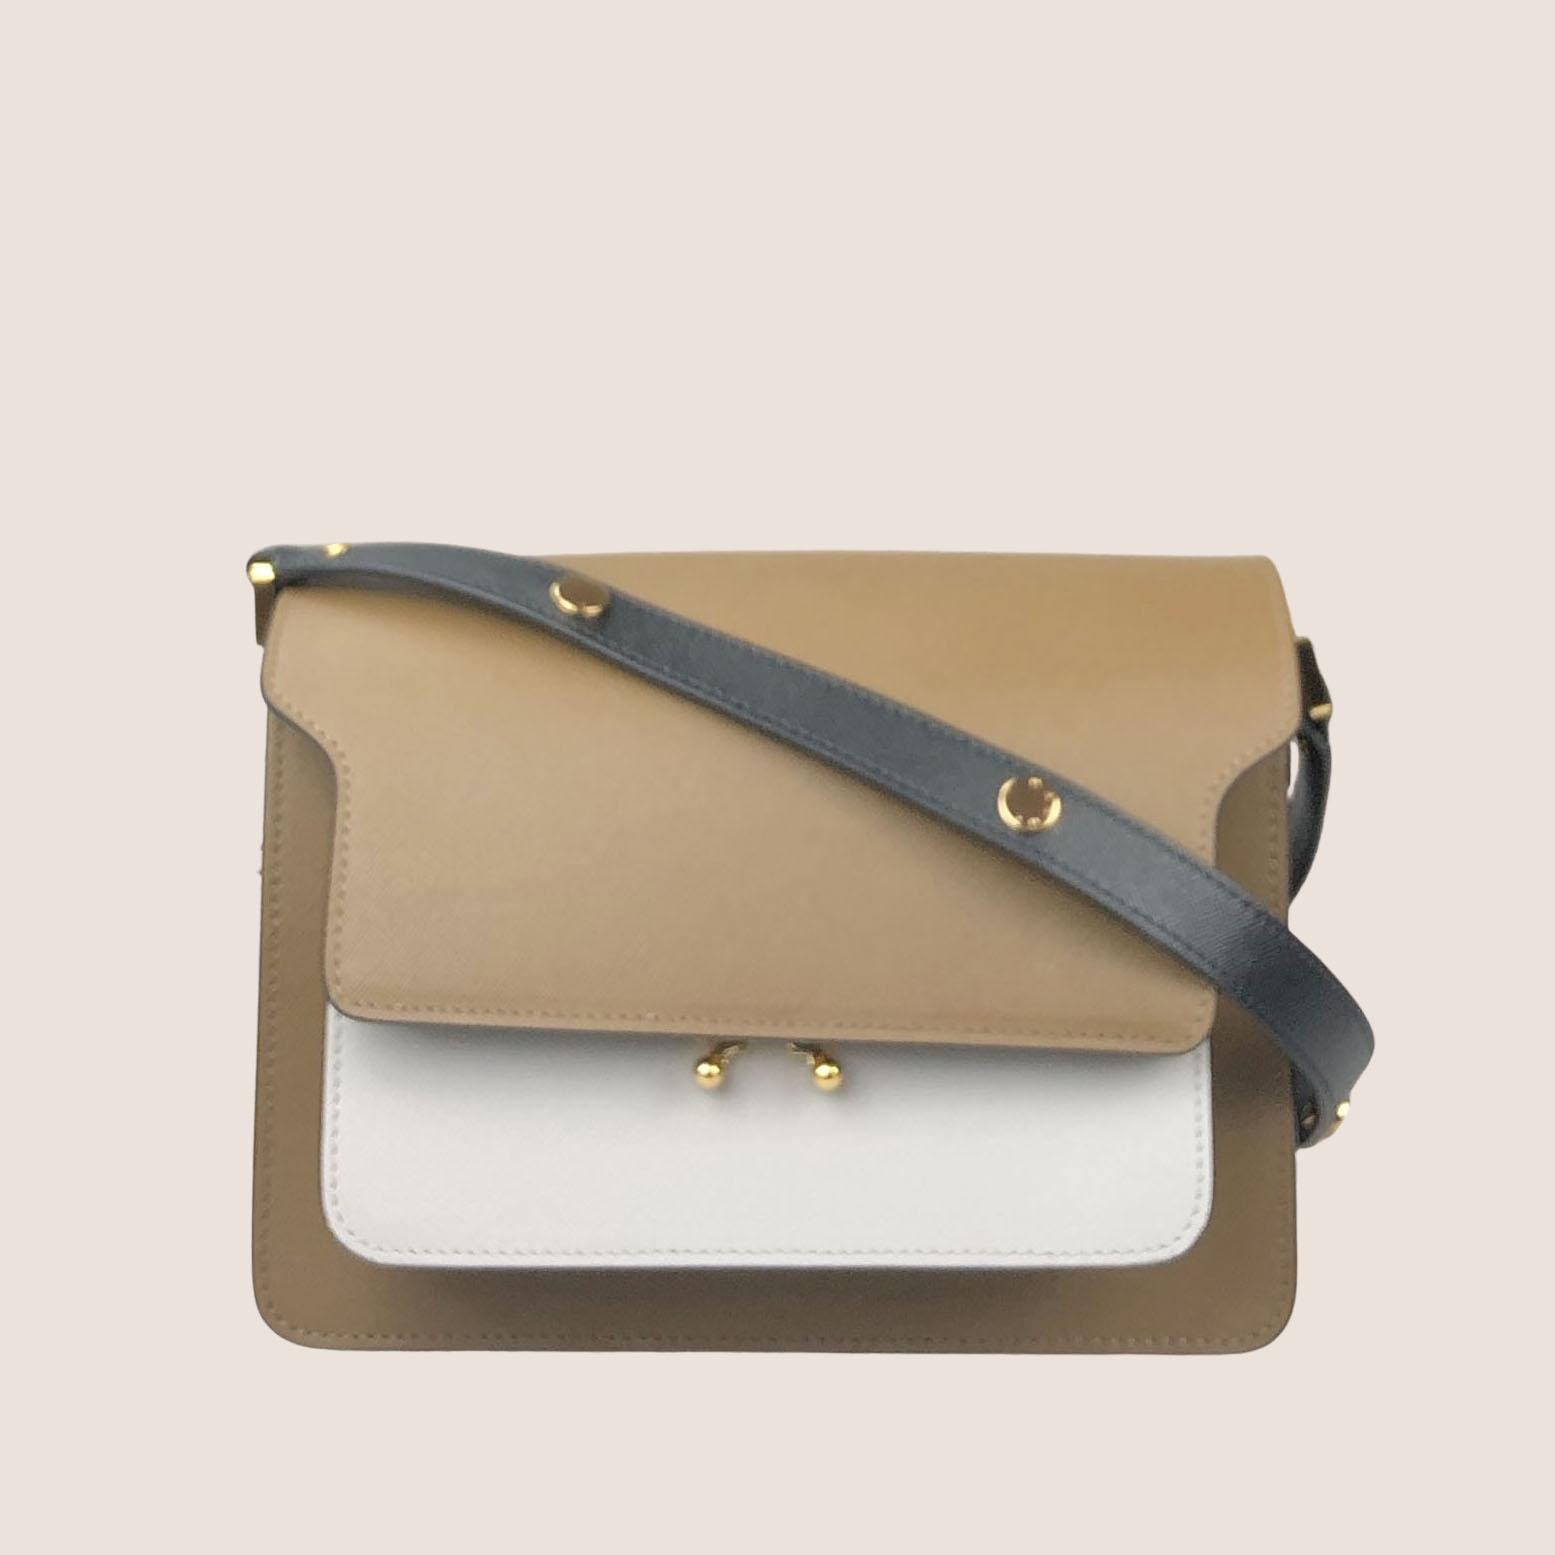 Trunk Bag Medium - Saffiano Multi